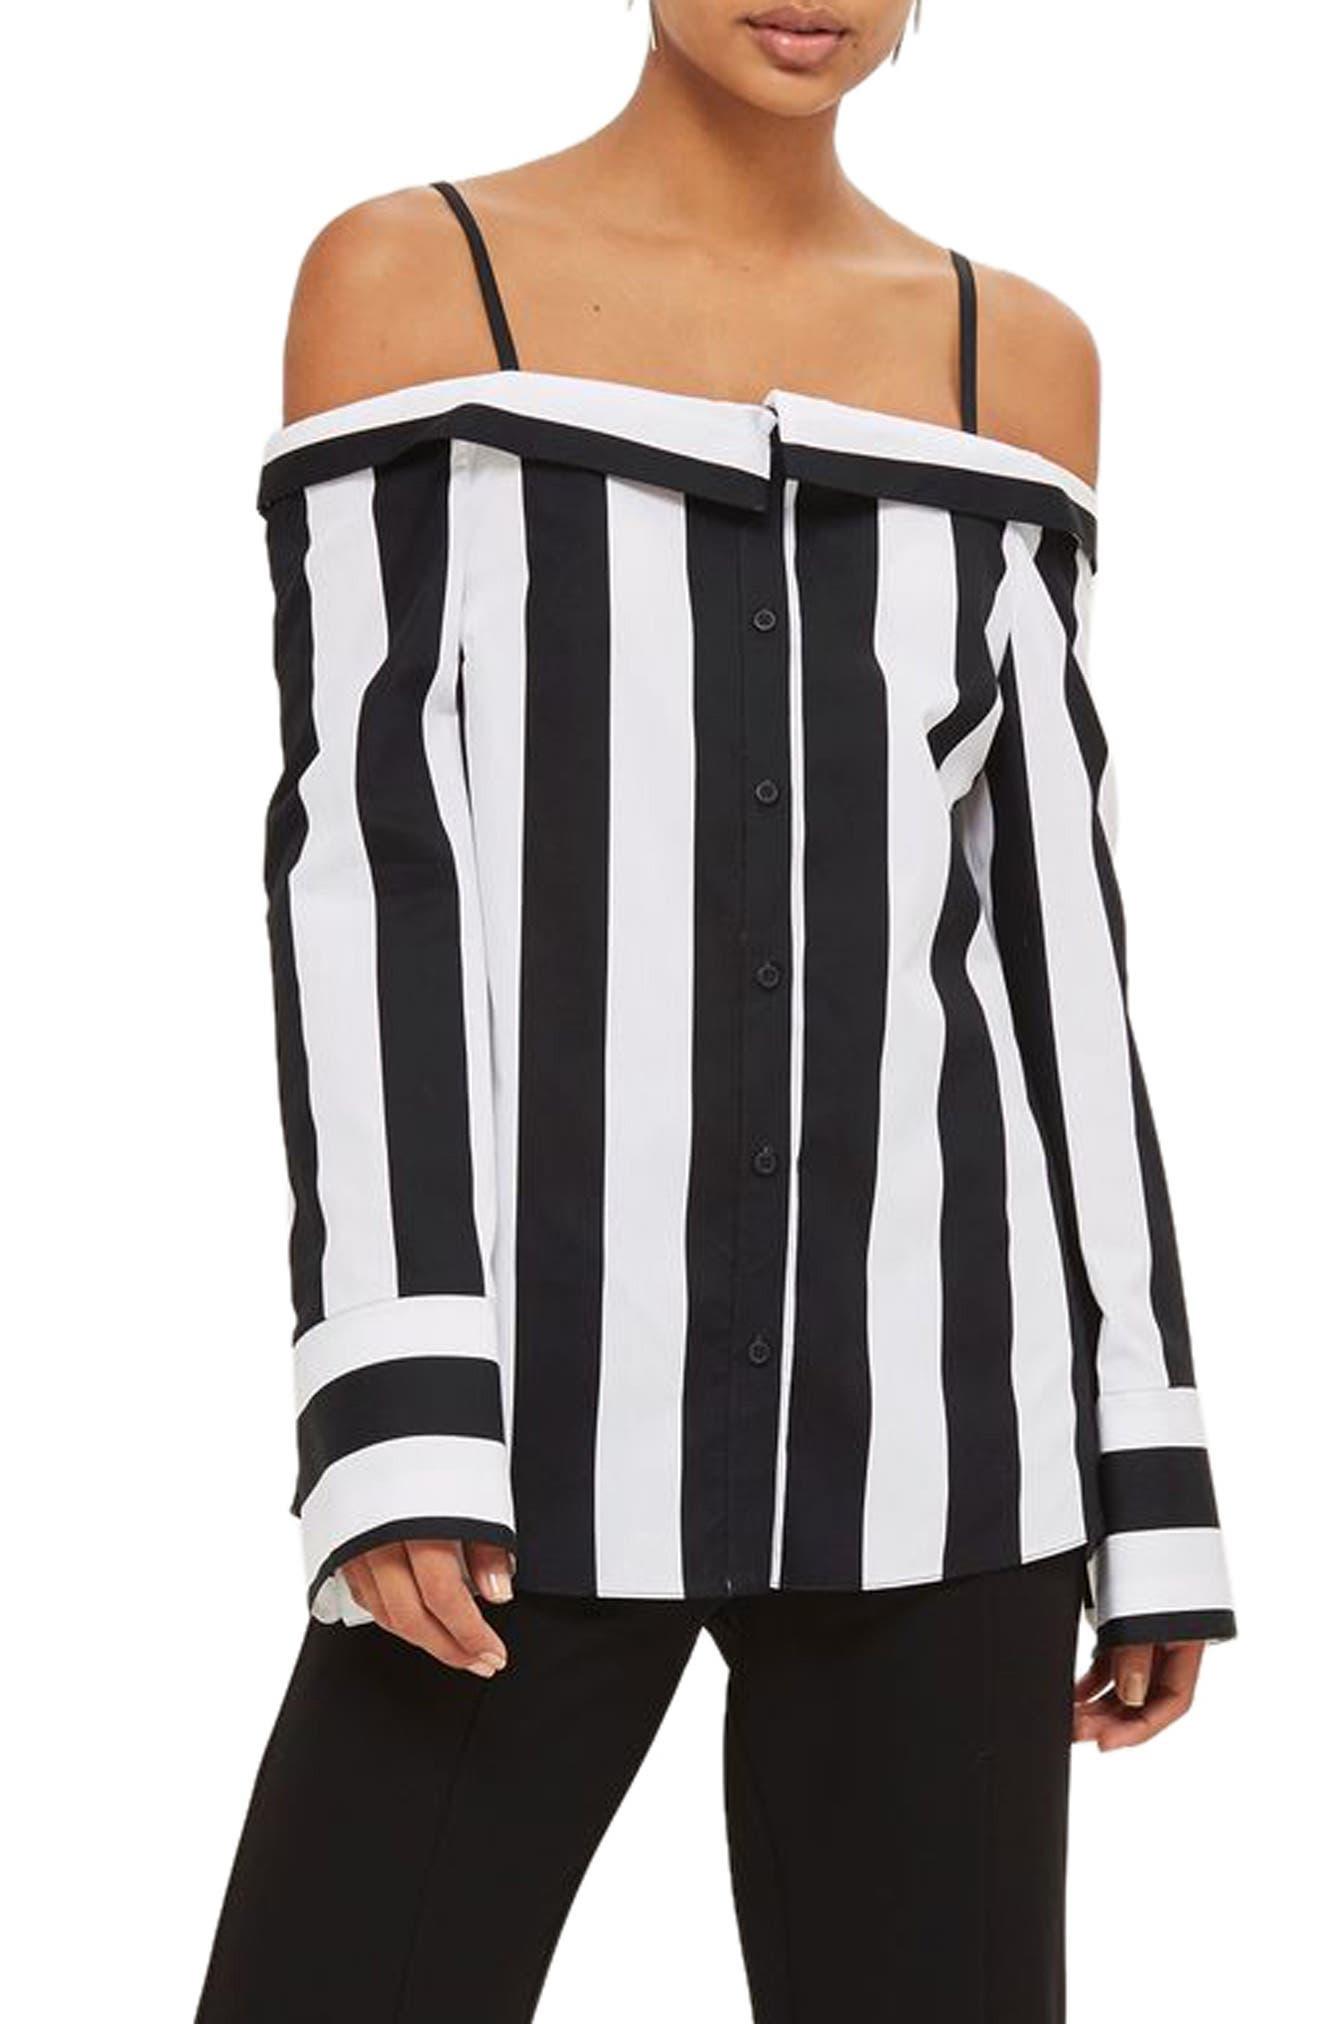 Humbug Stripe Off the Shoulder Shirt,                             Main thumbnail 1, color,